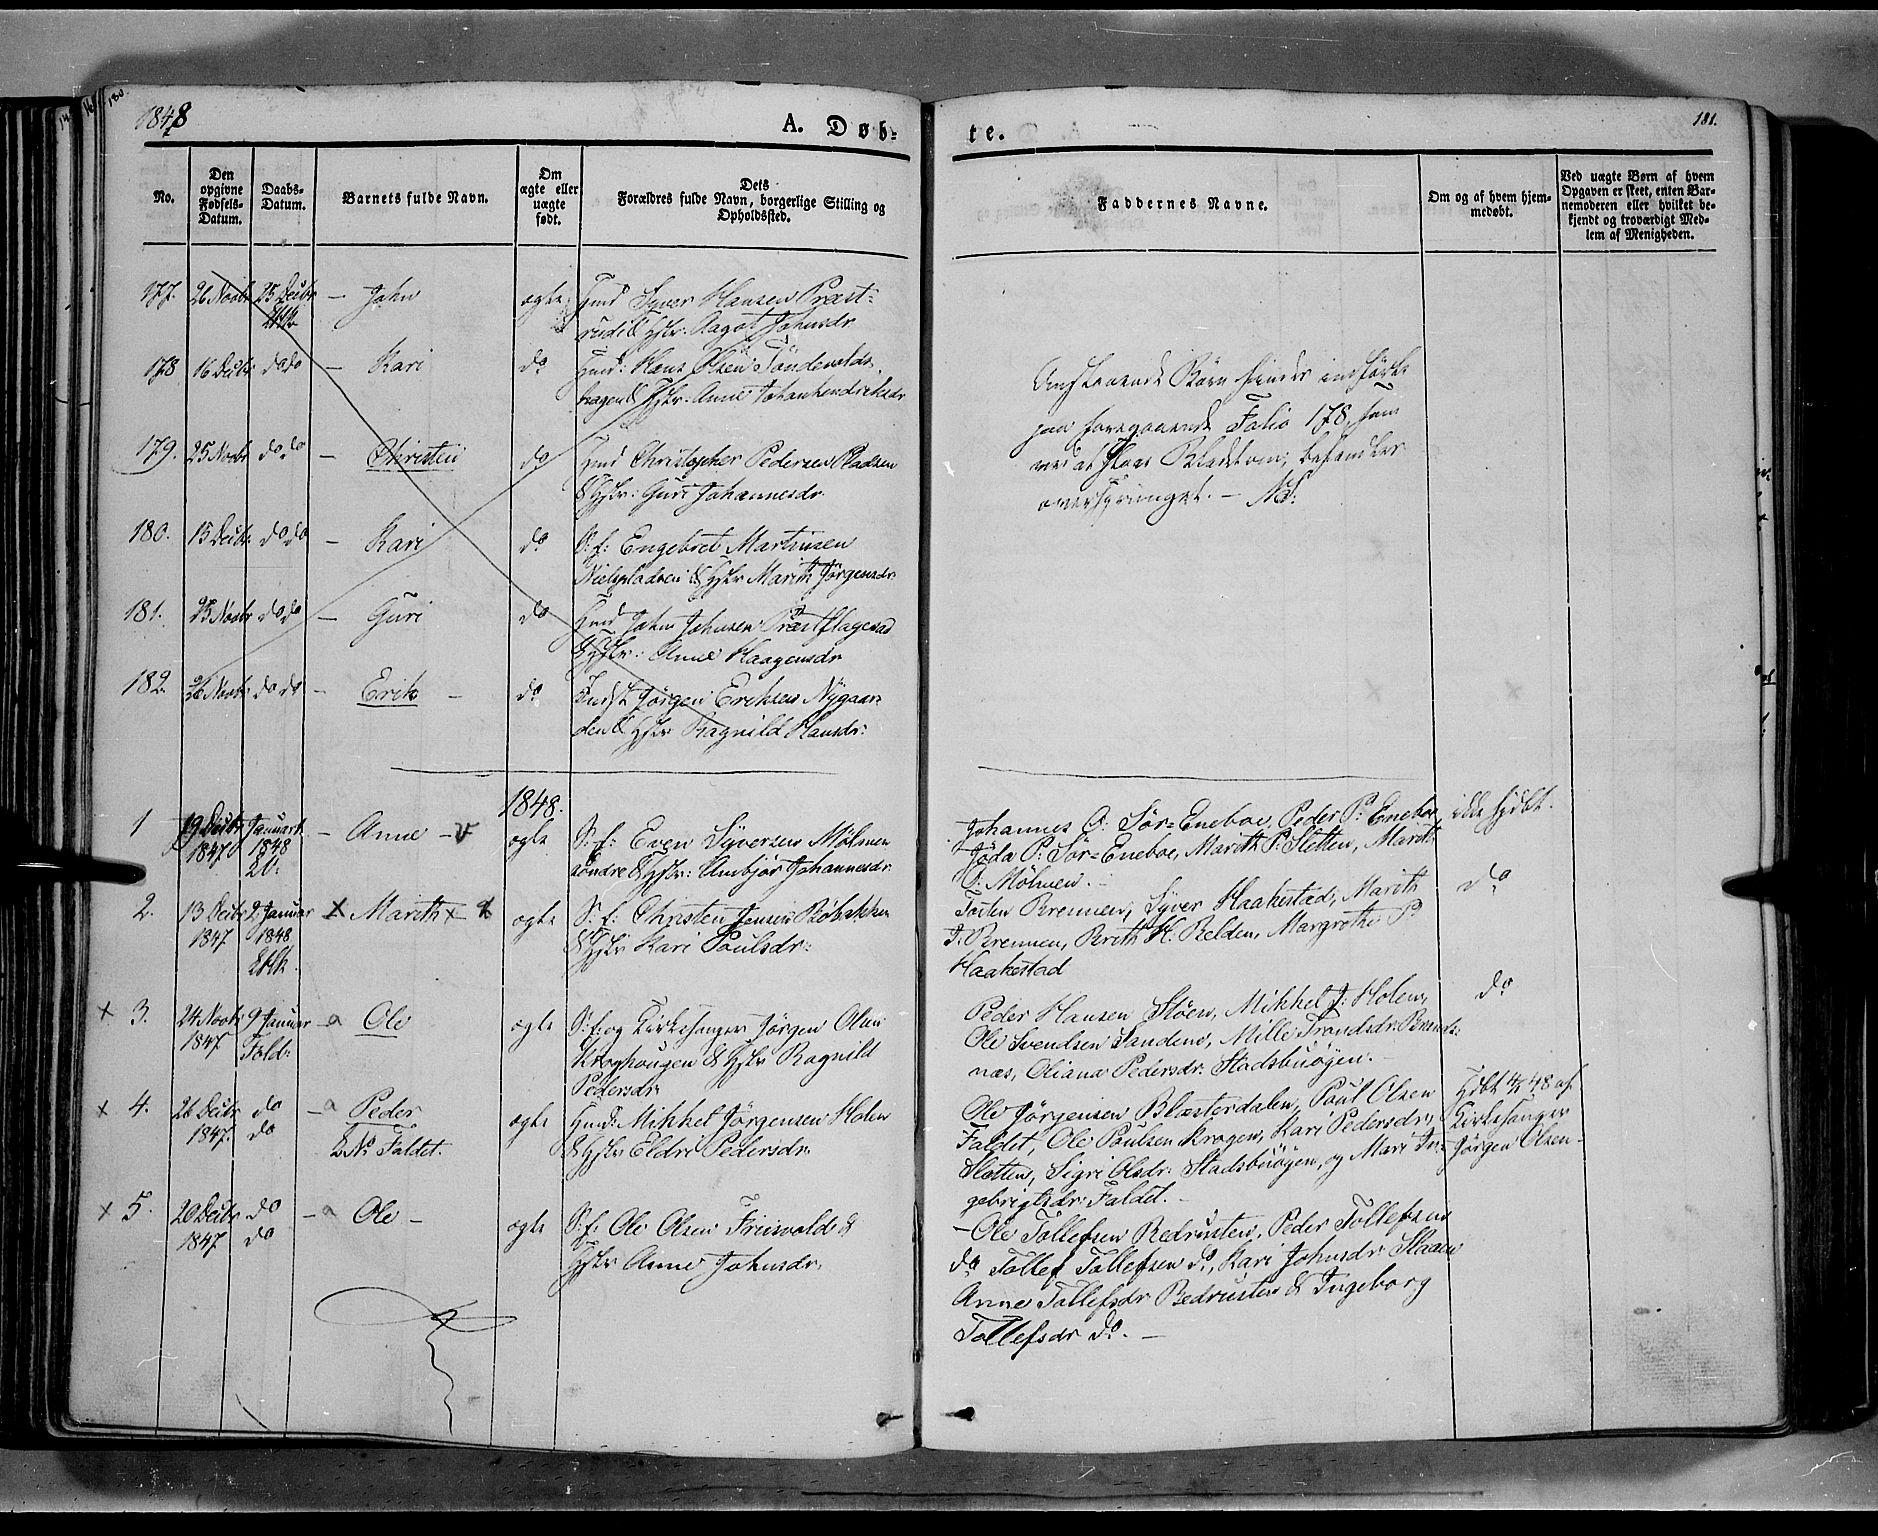 SAH, Lesja prestekontor, Ministerialbok nr. 6A, 1843-1854, s. 180-181